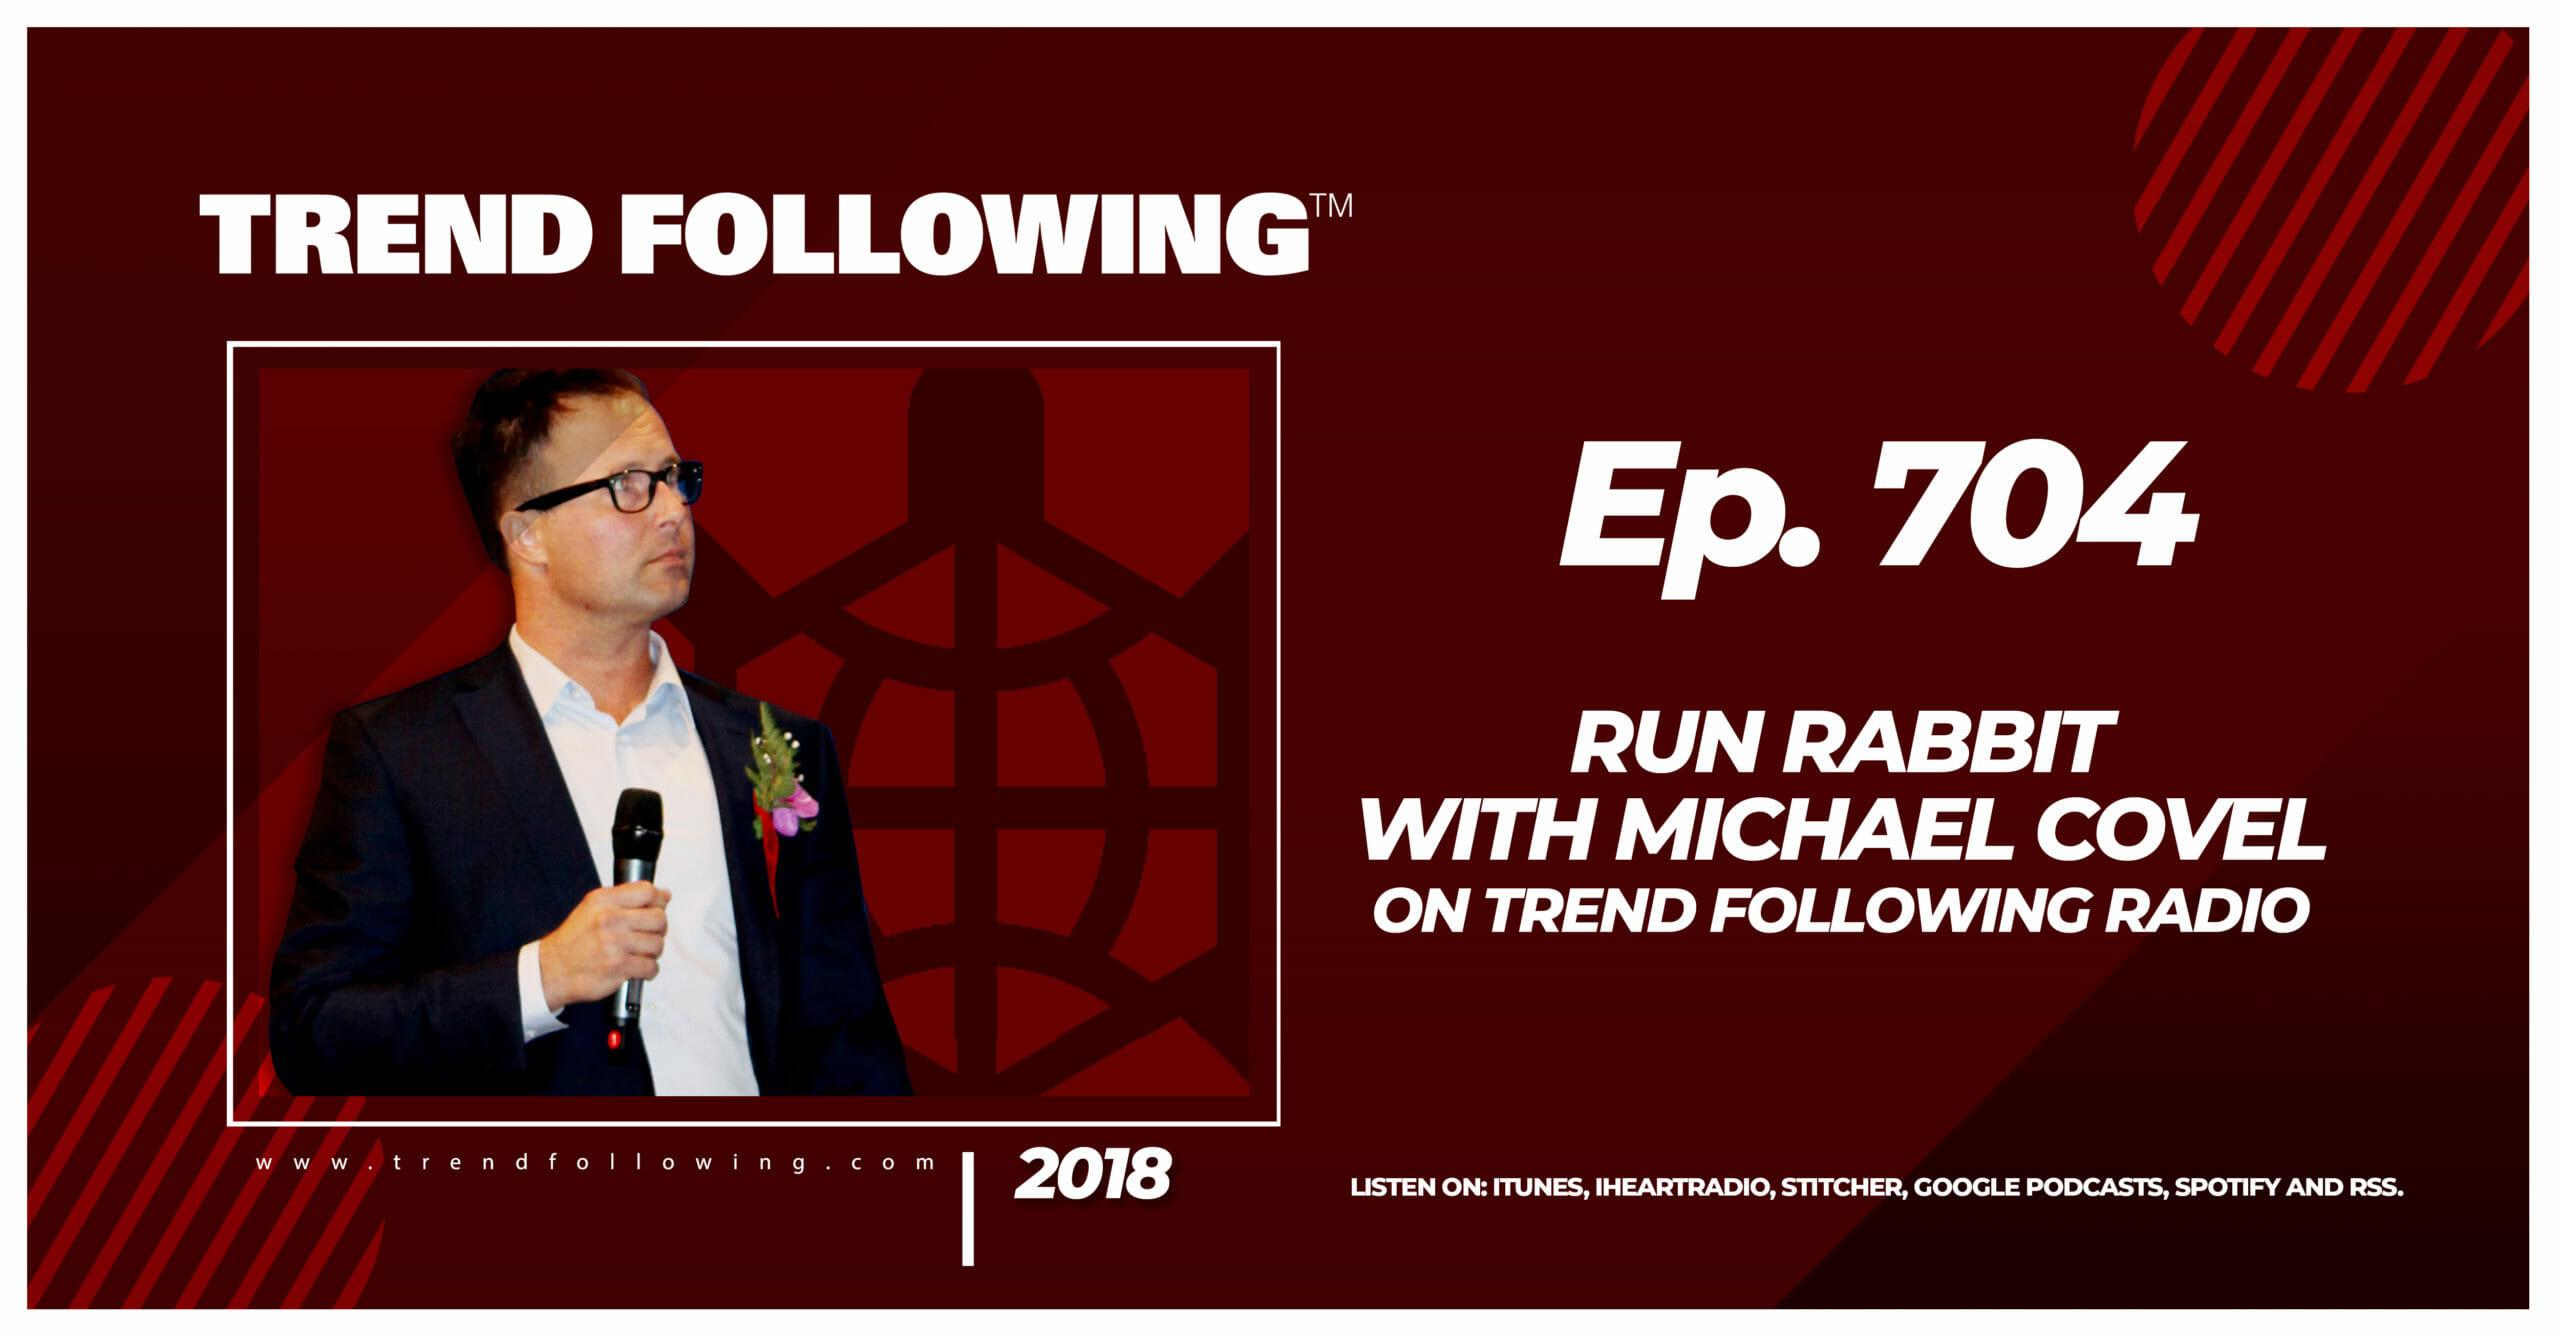 Run Rabbit with Michael Covel on Trend Following Radio